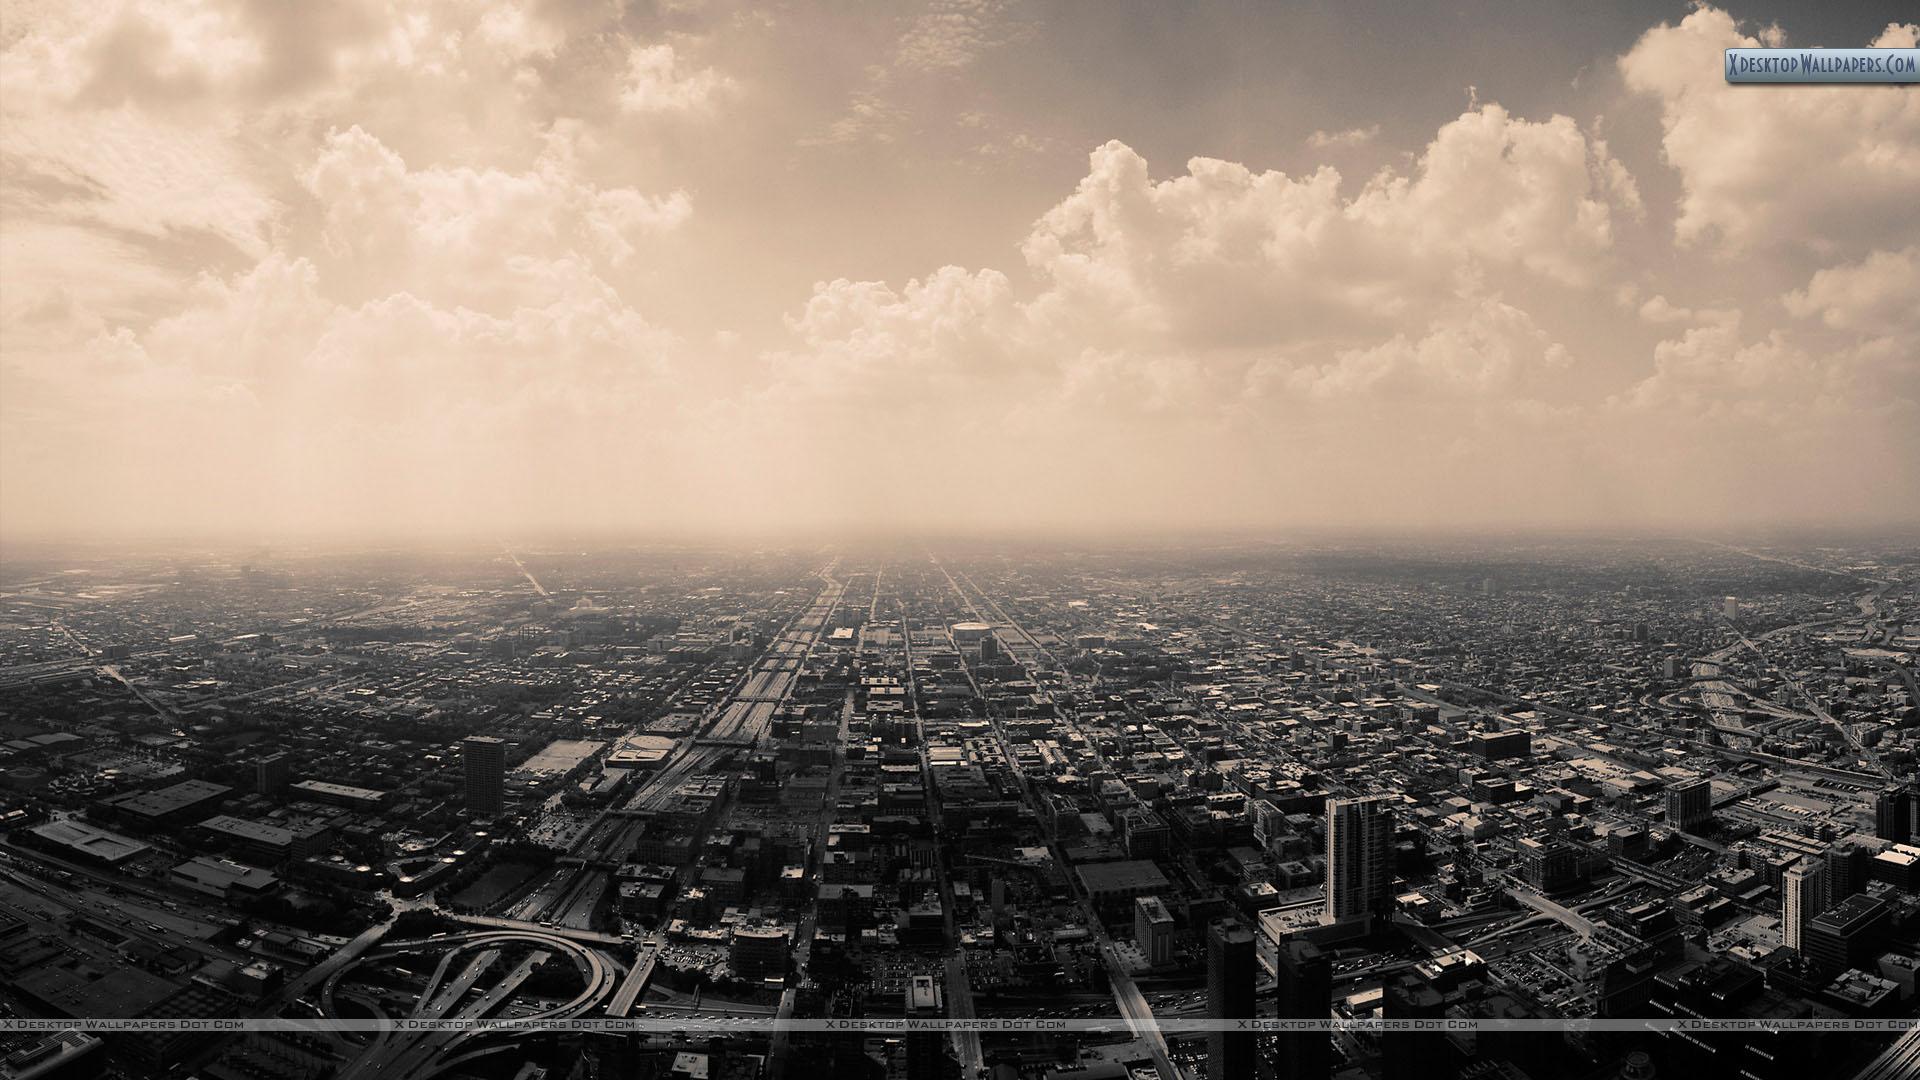 Top View Of Black White City Wallpaper 1920x1080